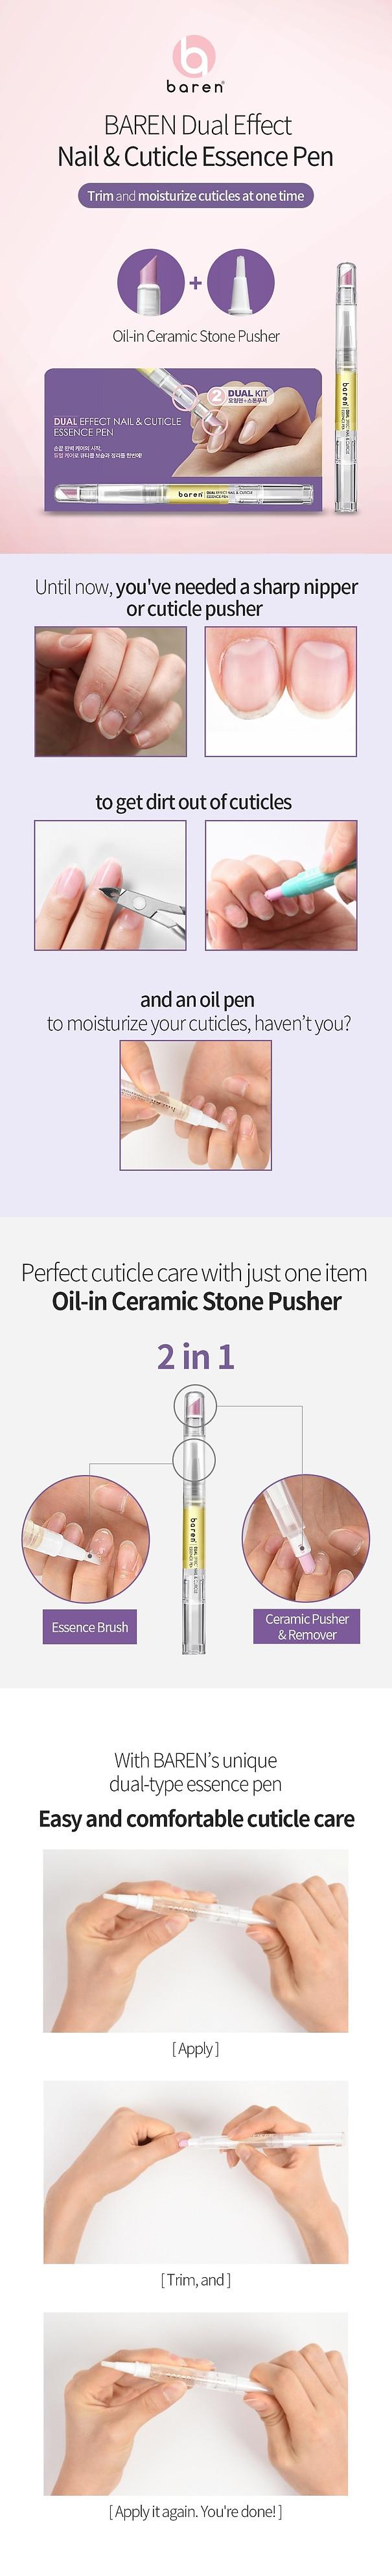 Dual effect nail&cuticle essence pen.eng_1.jpg